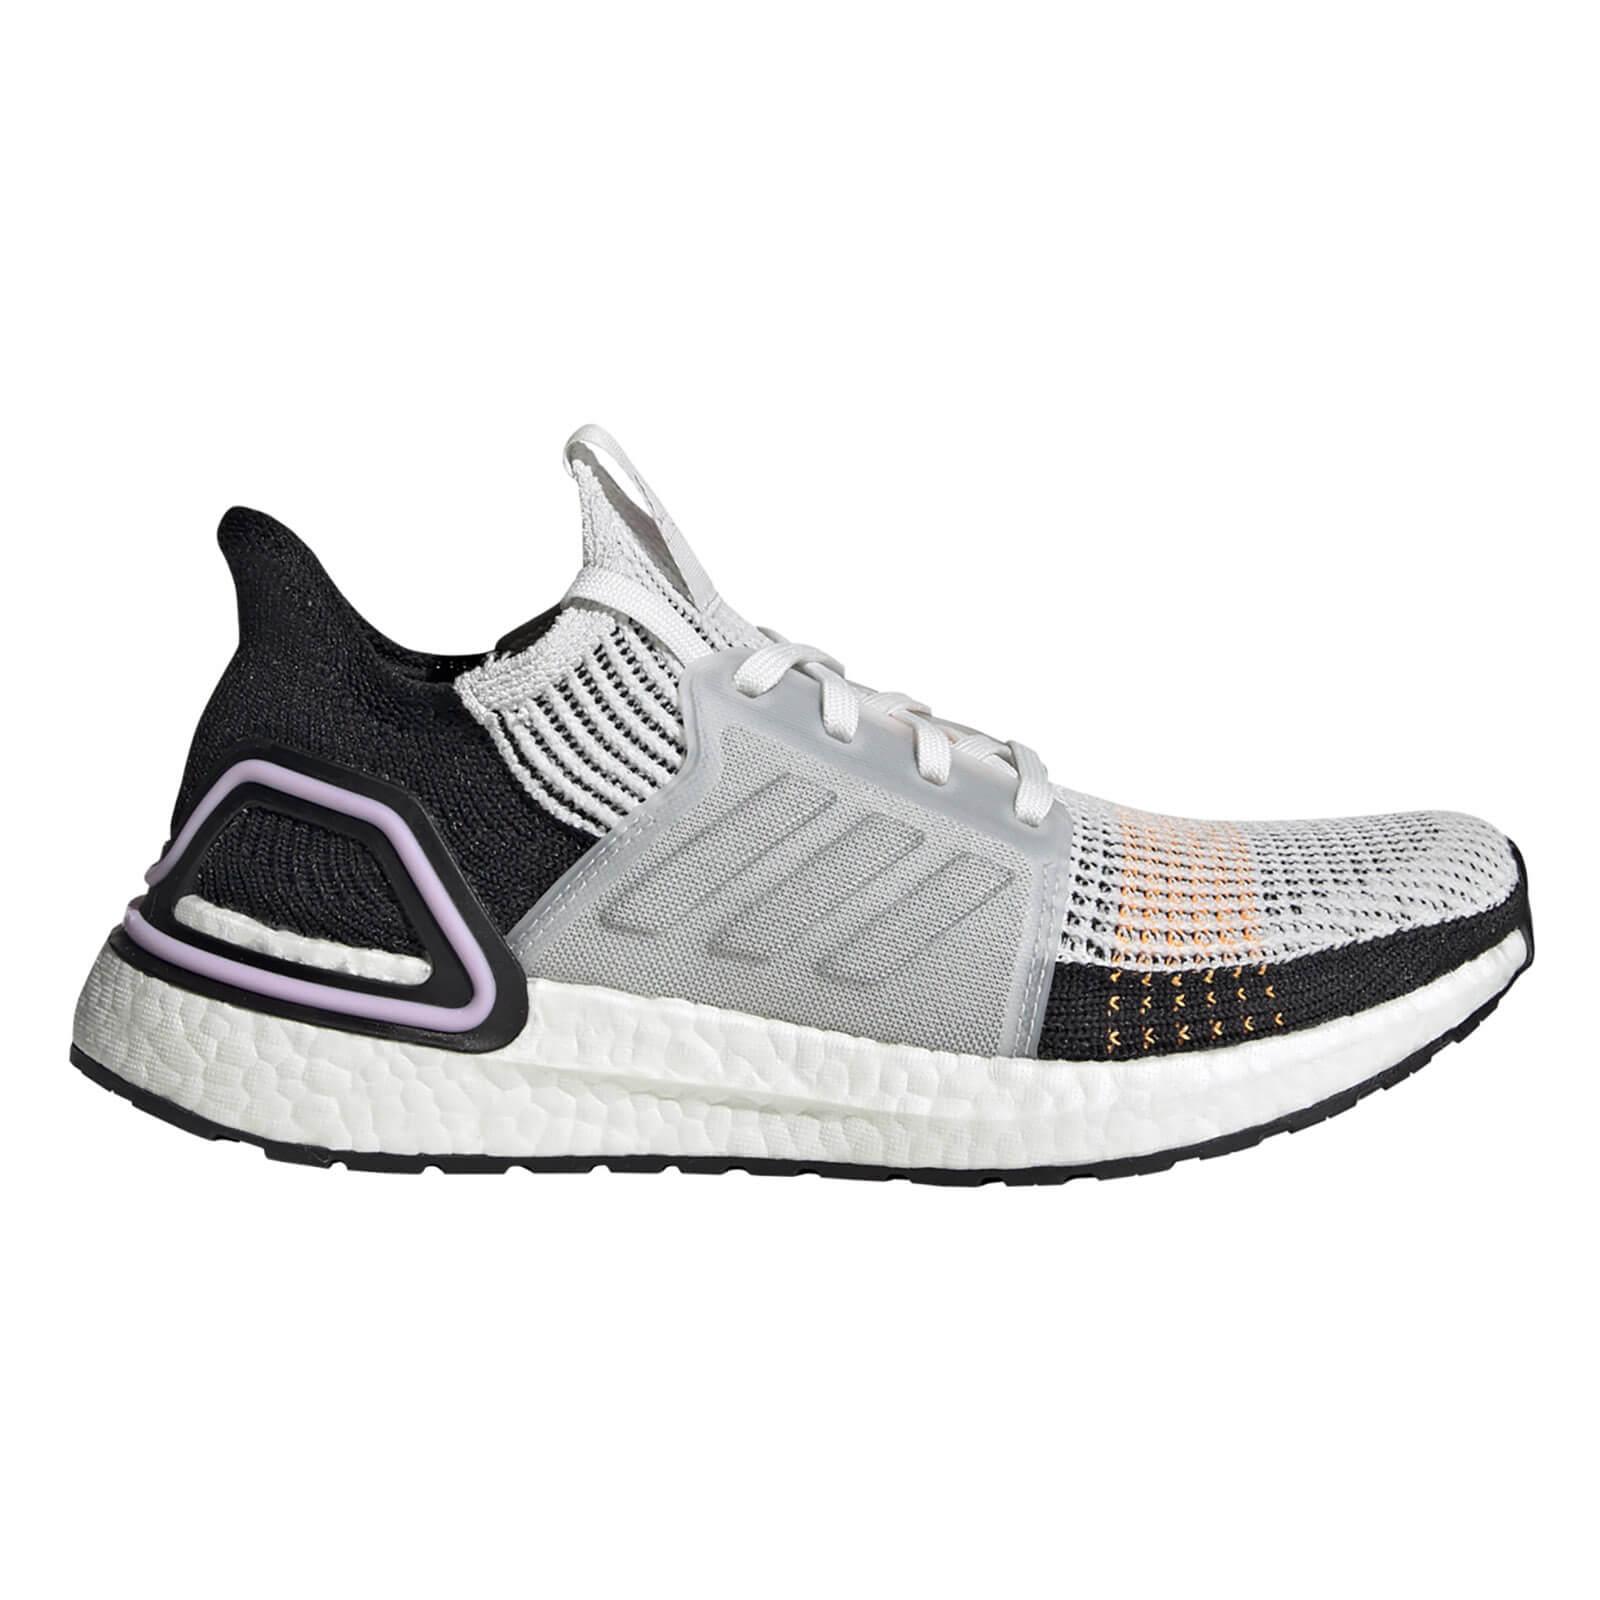 adidas Women's Ultraboost 19 Running Shoes - White/Black - 6